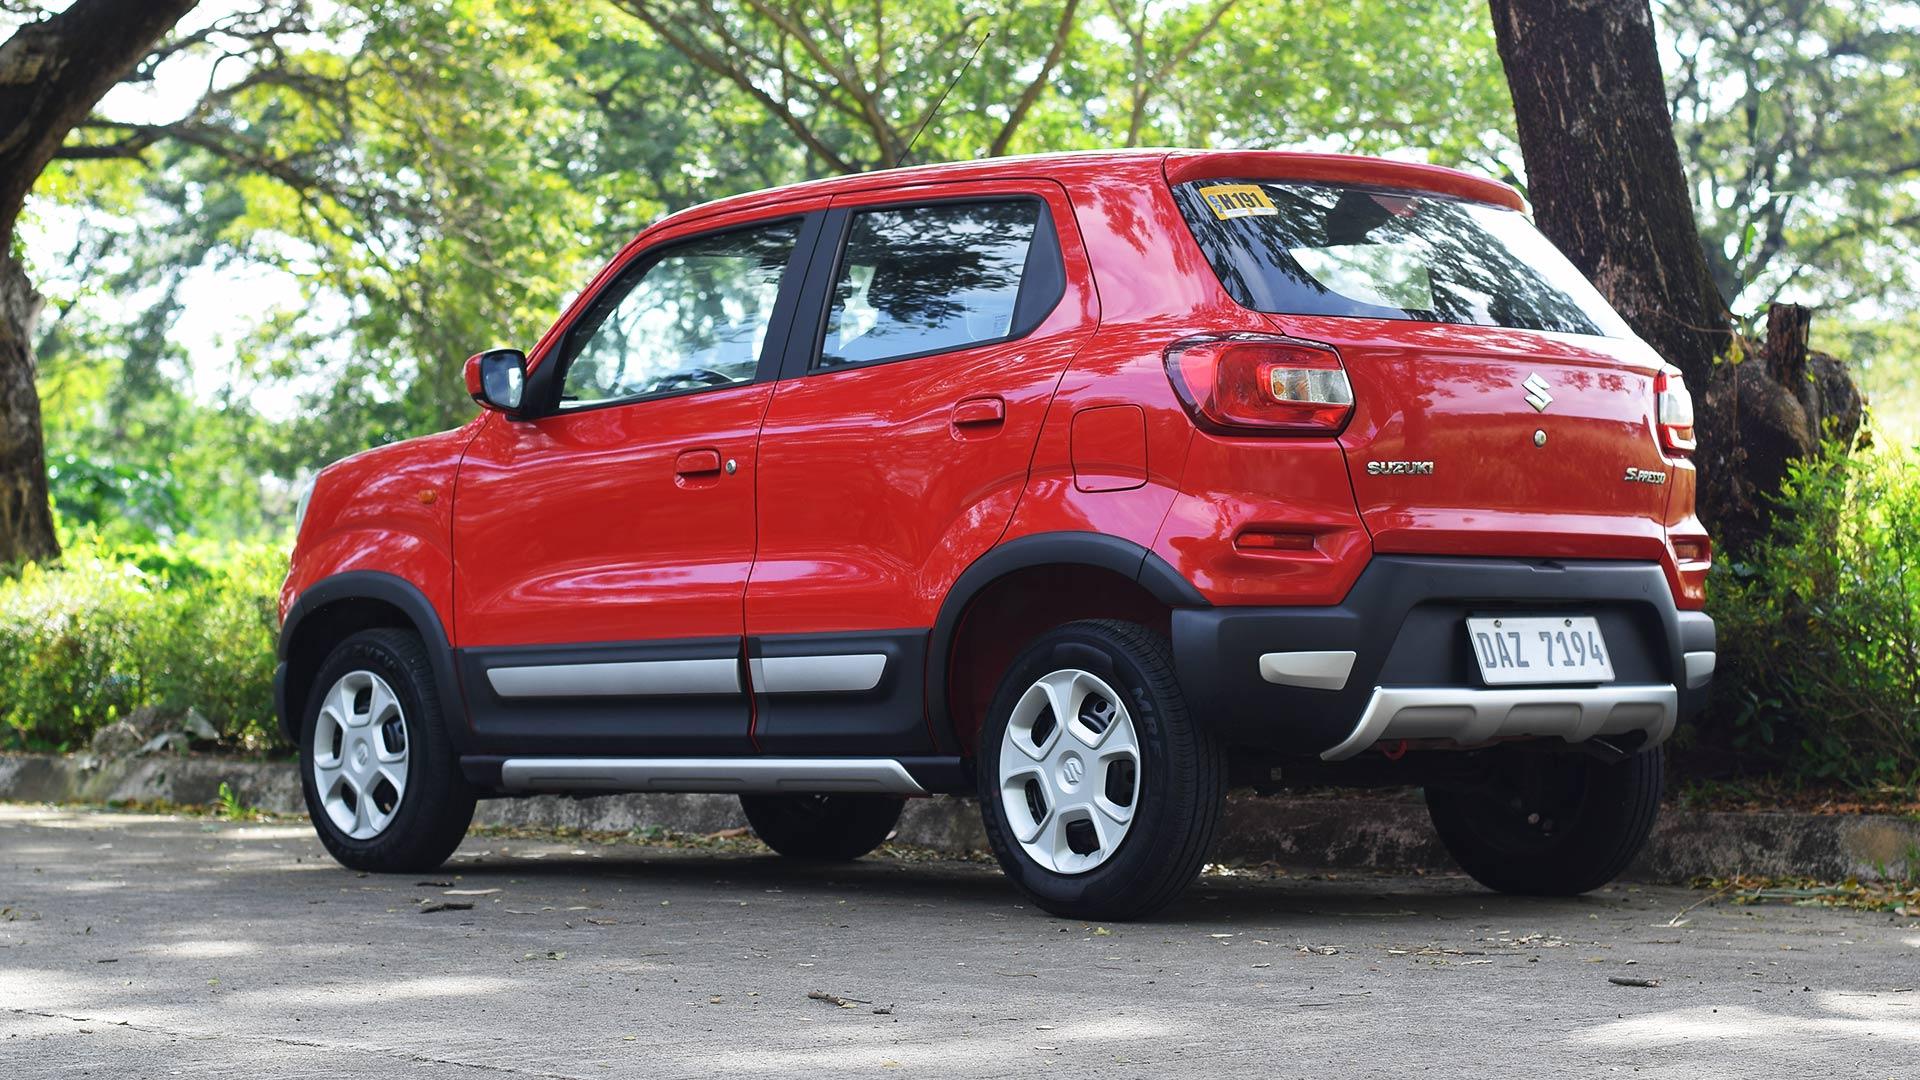 The Suzuki S-Presso parked rear view